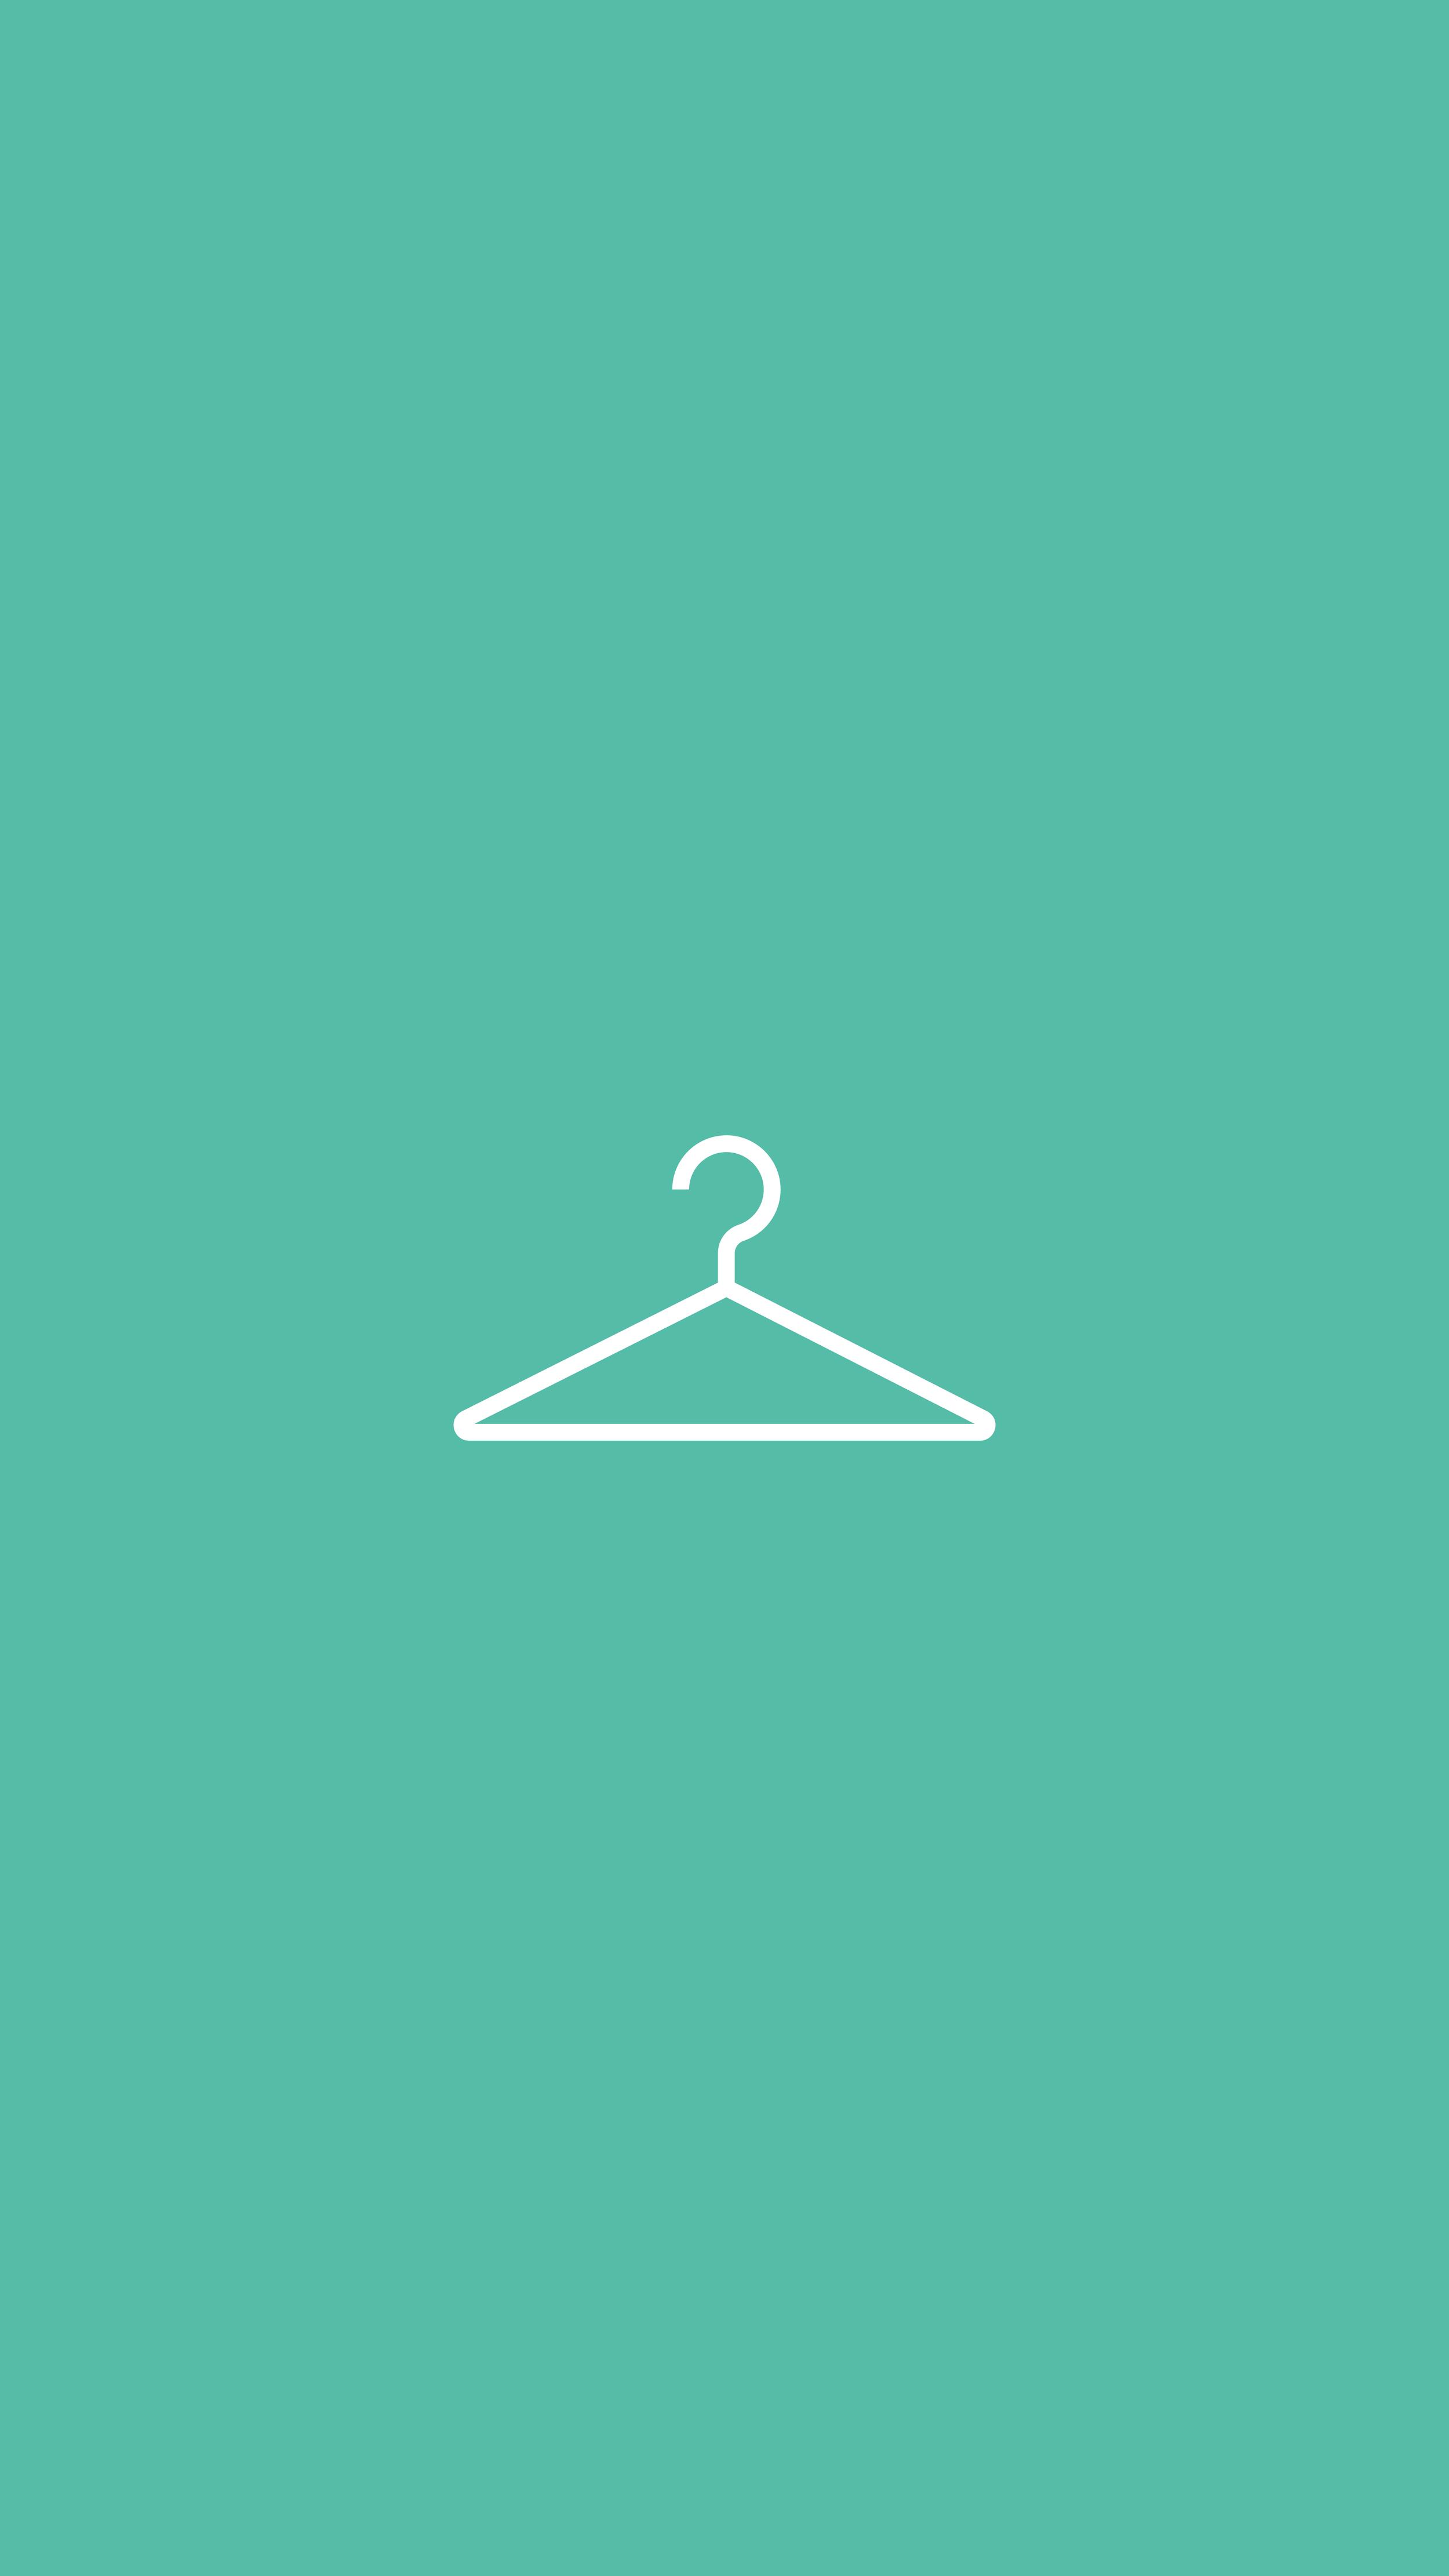 Clothes, Closet, Hanger, Wardrobe